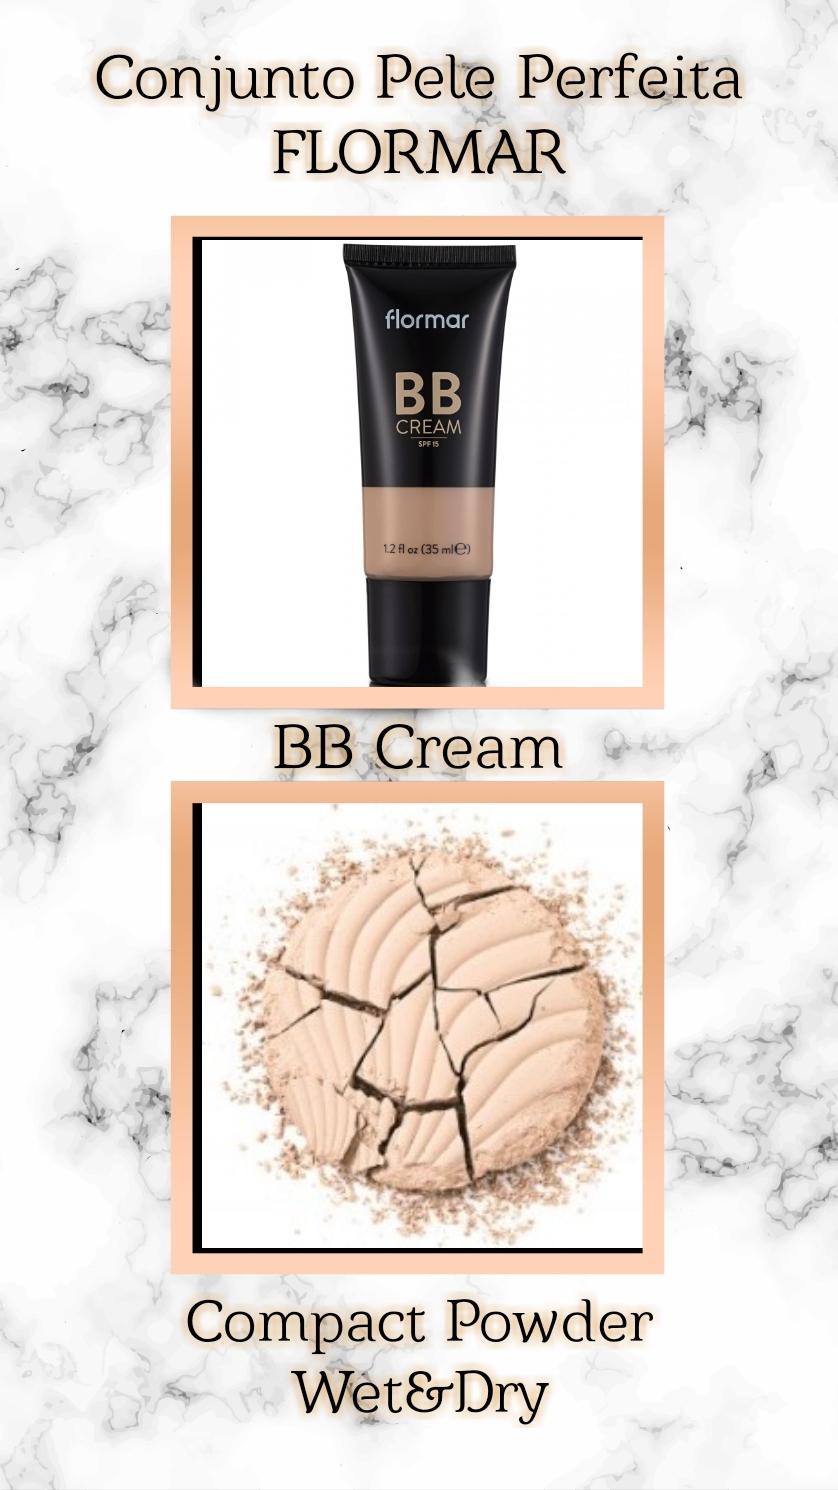 Conjunto pele perfeita  FLORMAR - BB CREAM + COMPACT POWDER